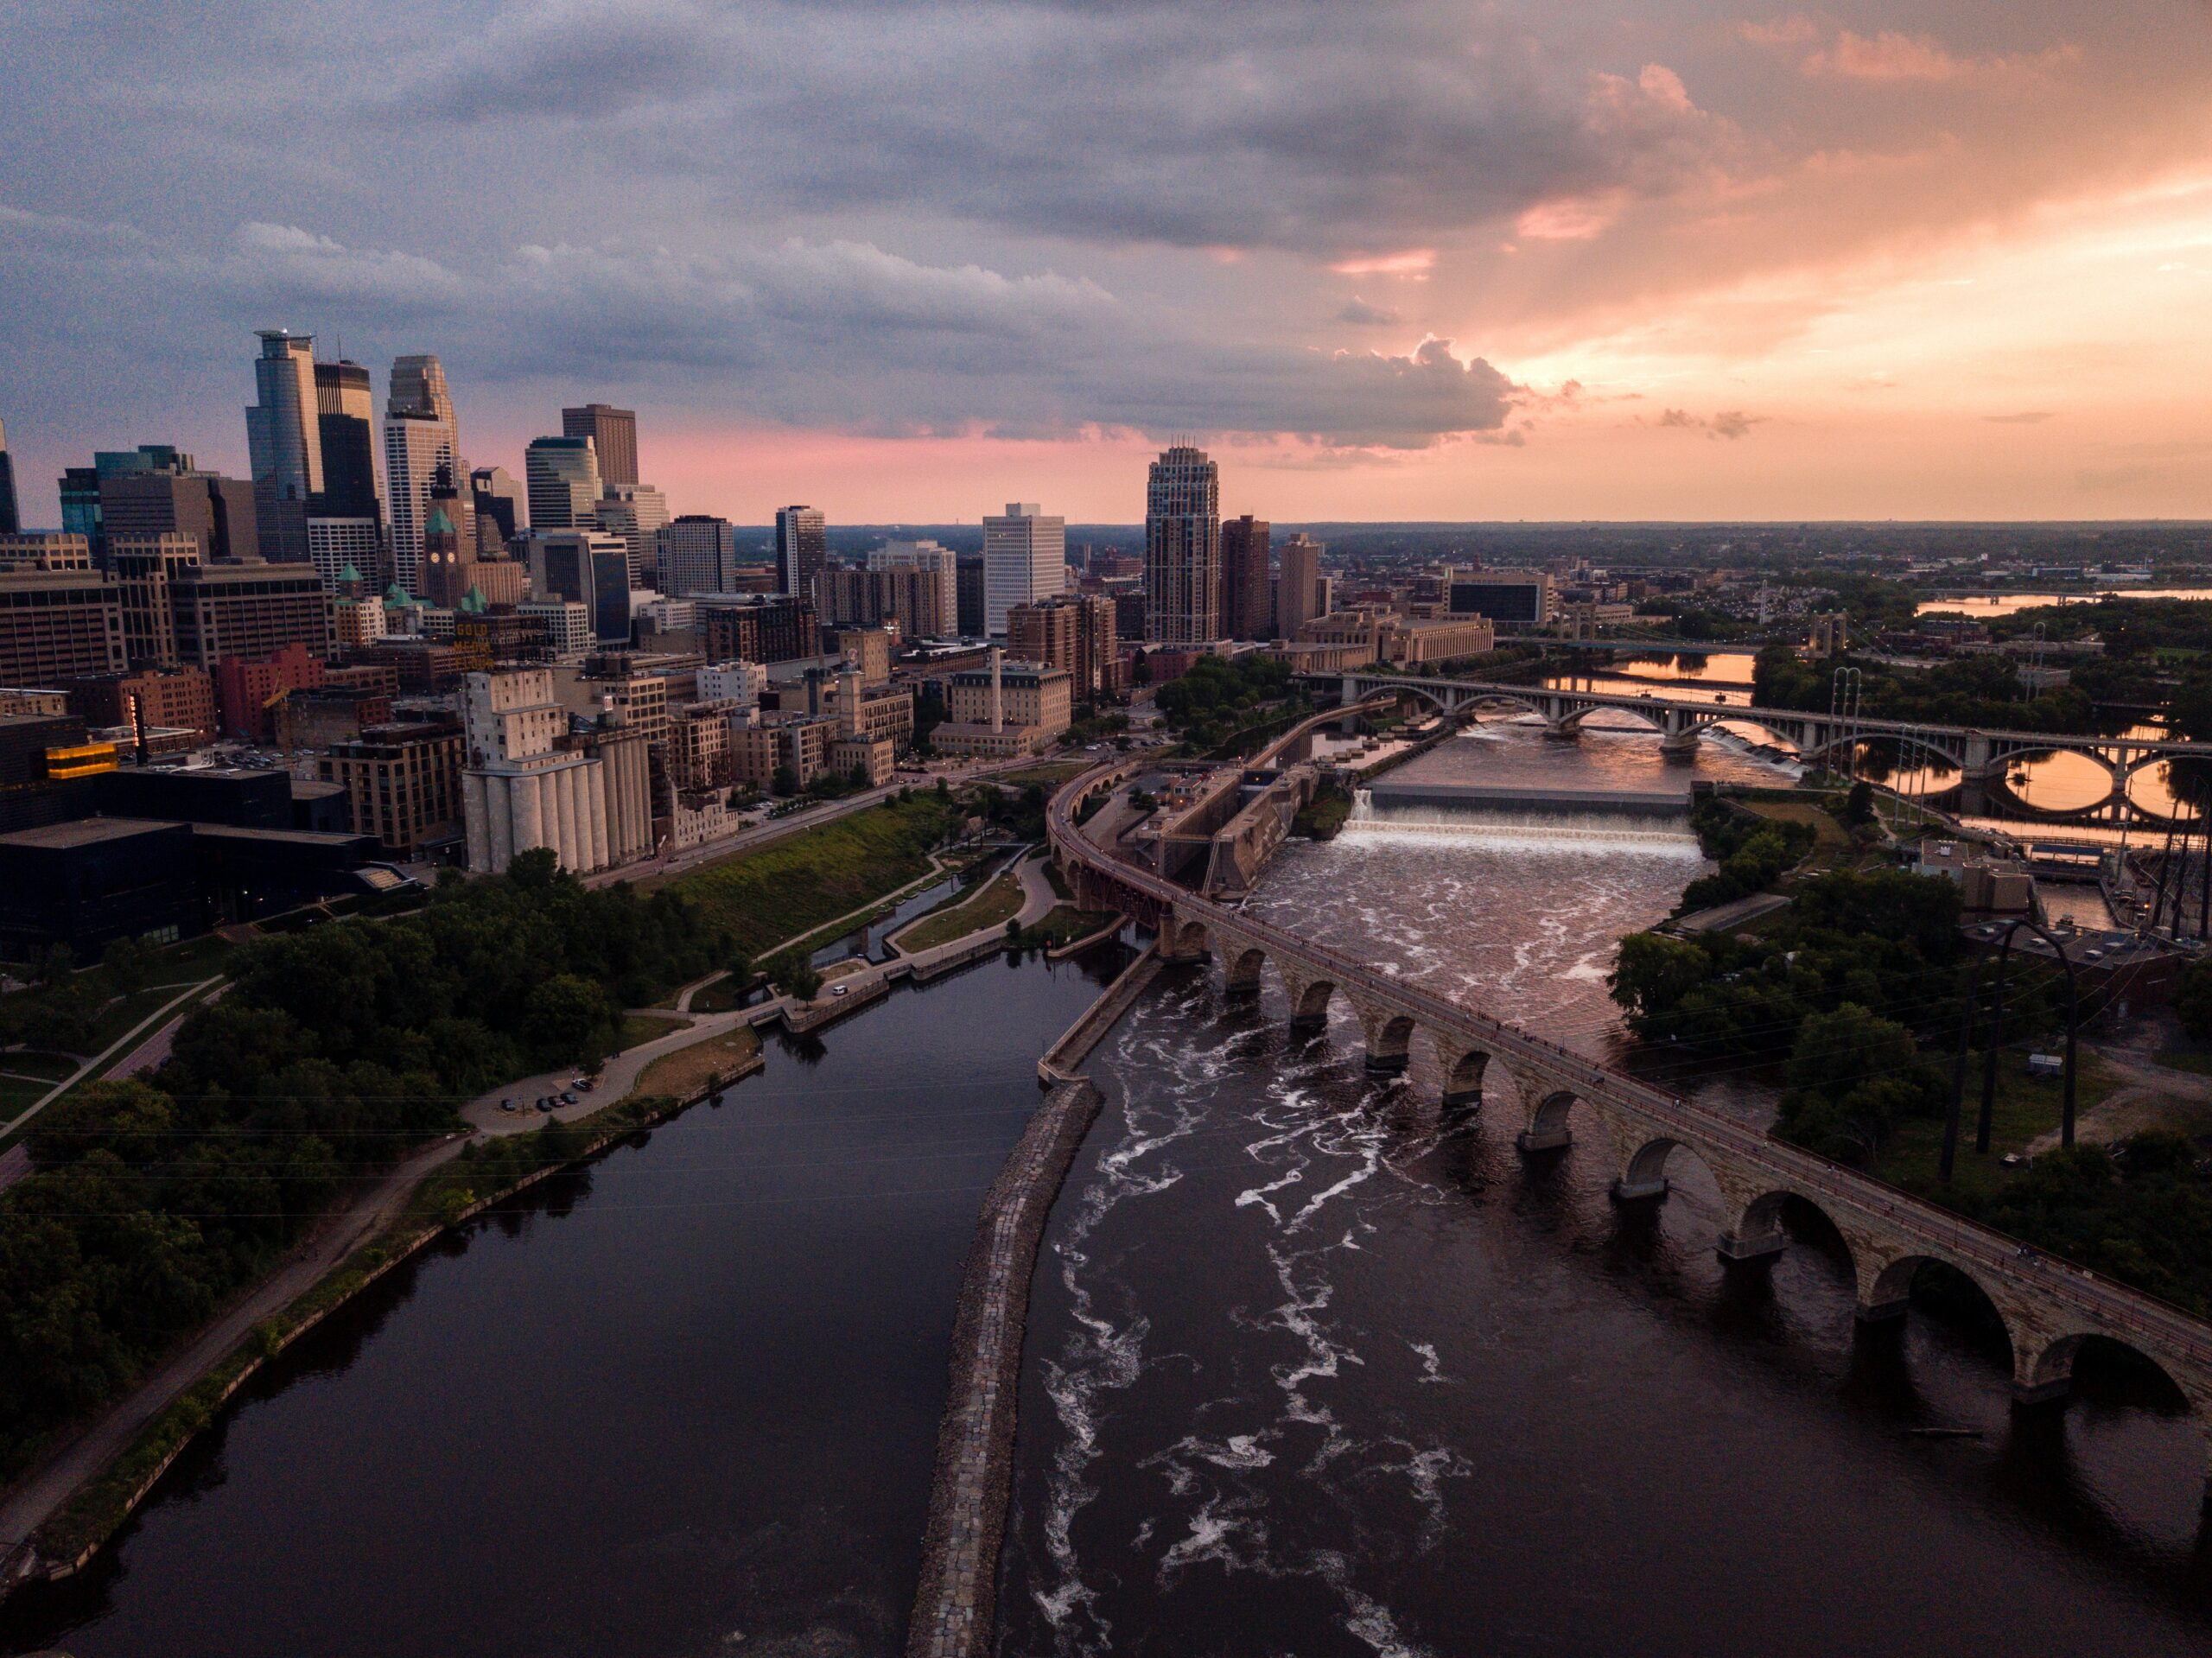 Minnesota Senators Introduce Recreational Cannabis Bill